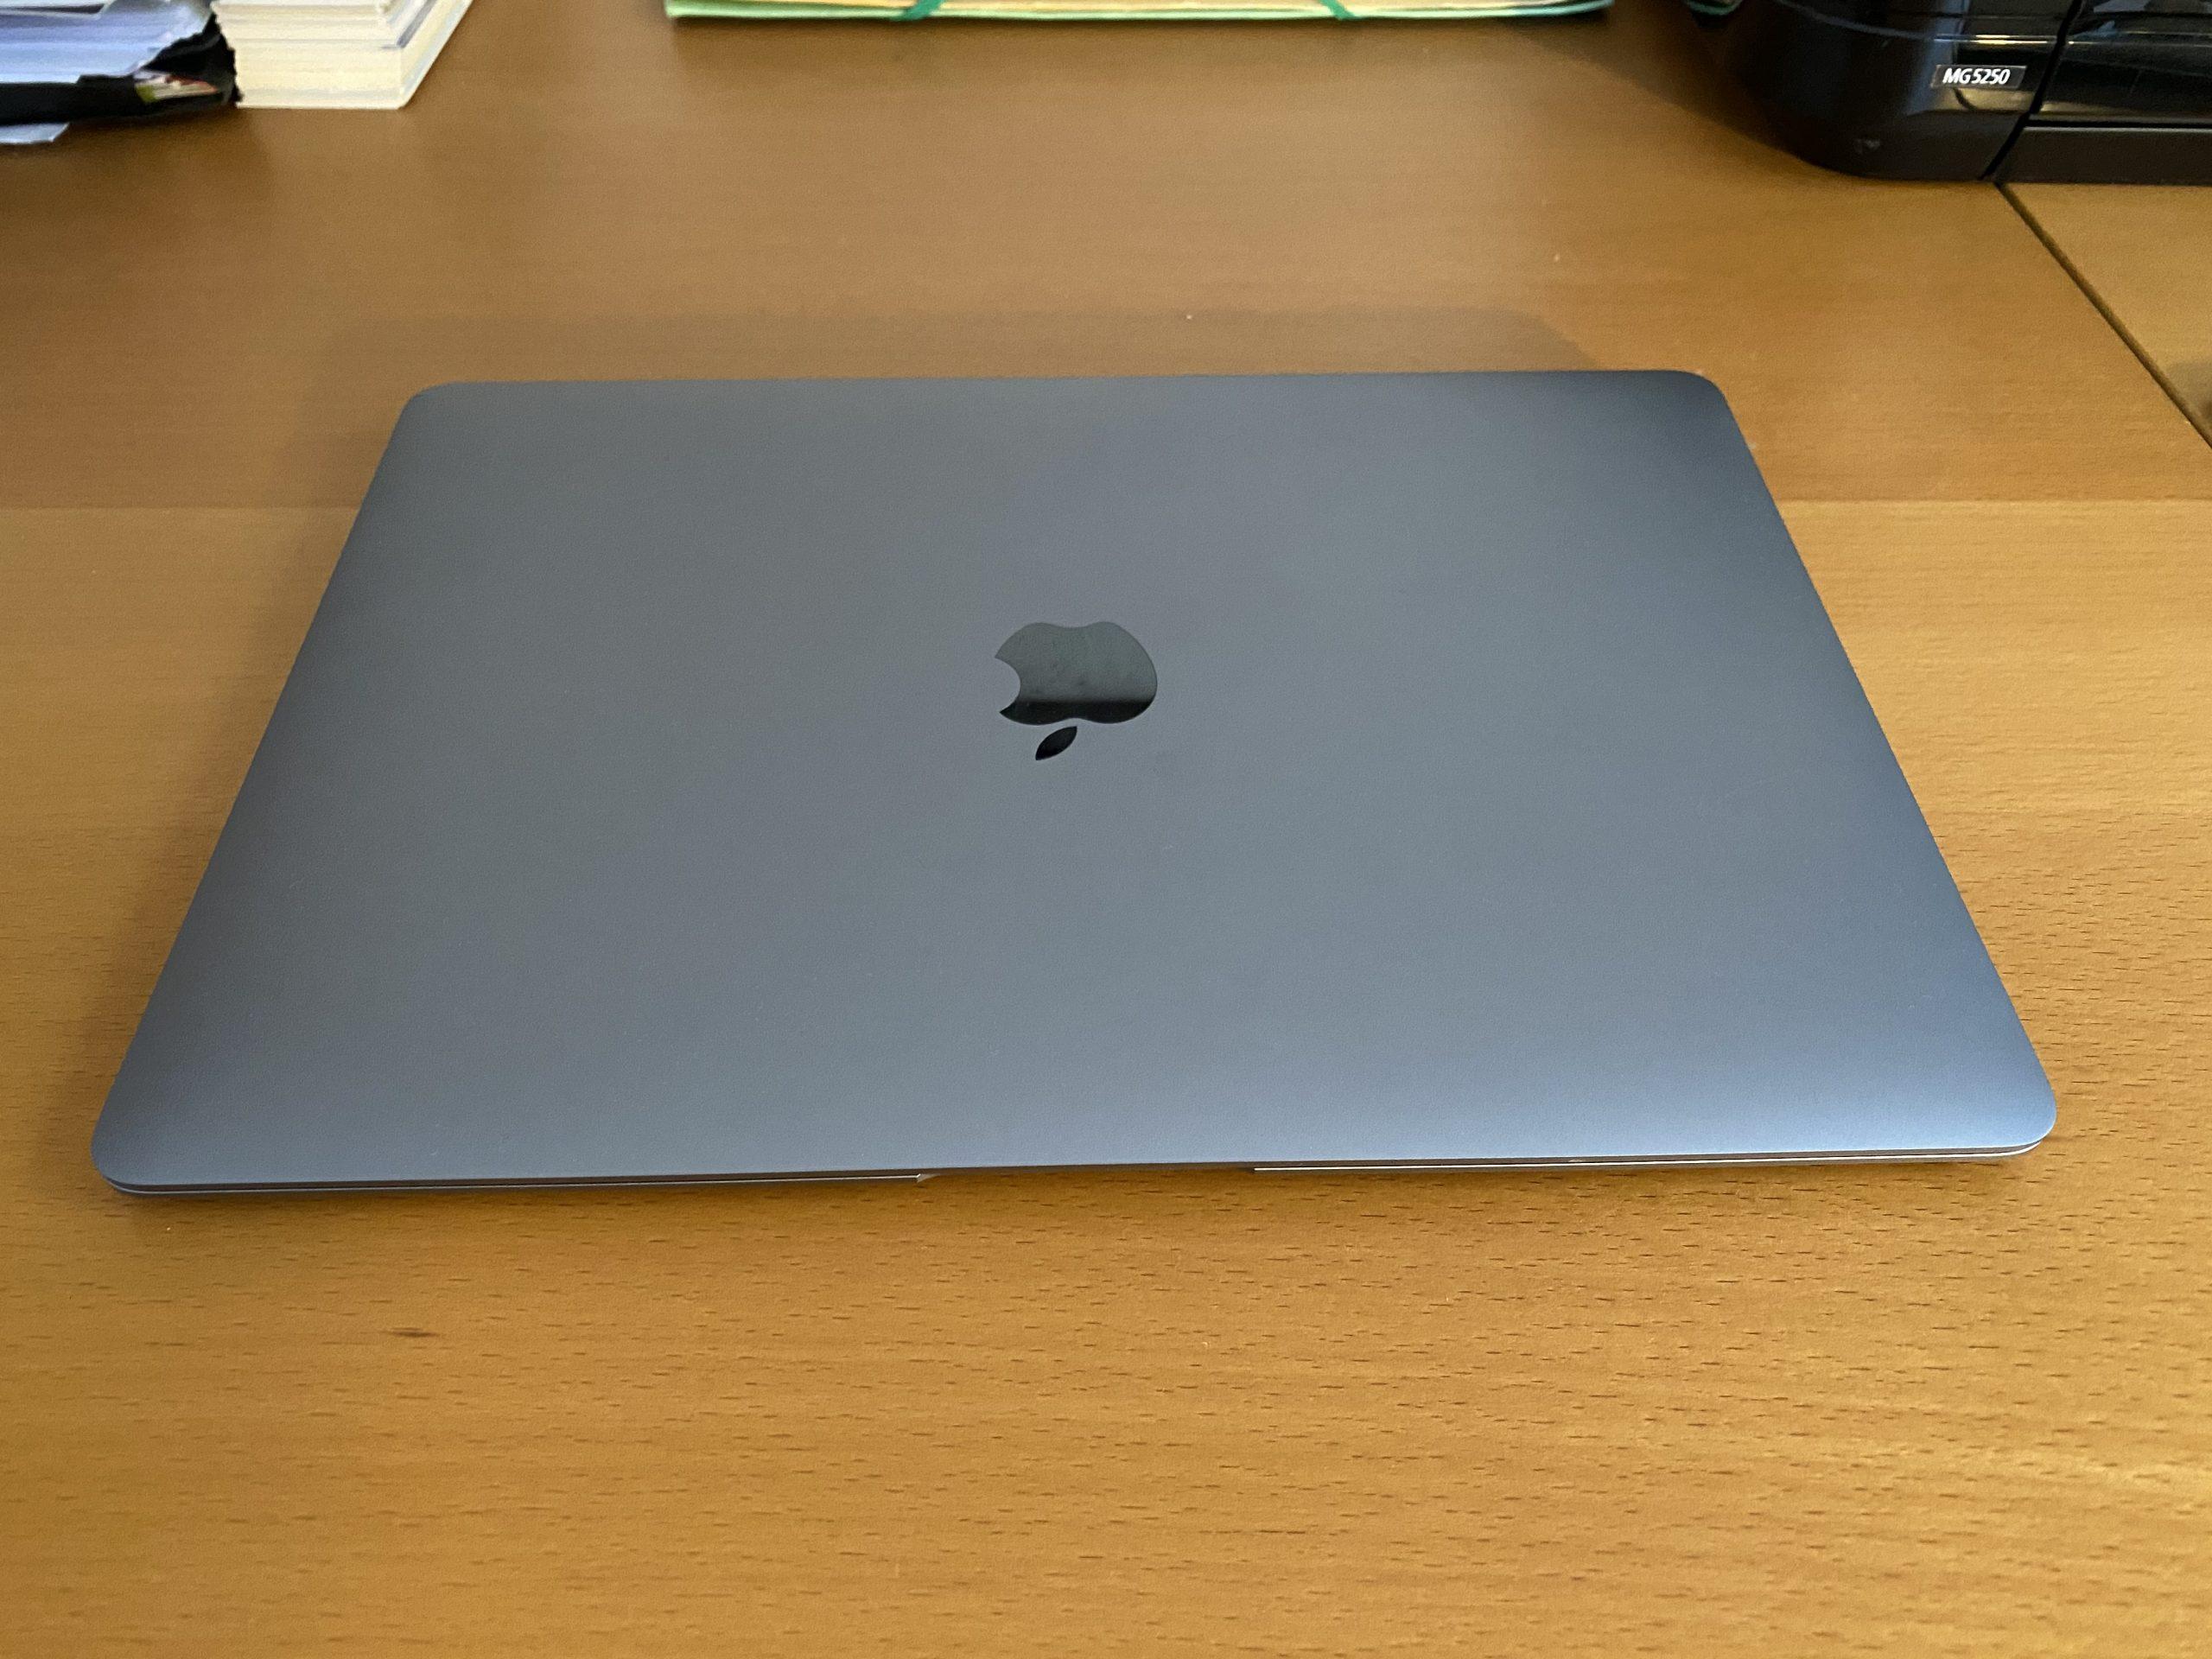 MacBook Air 2020 i5 - SSD 512Go - RAM 8Go - iOccasion